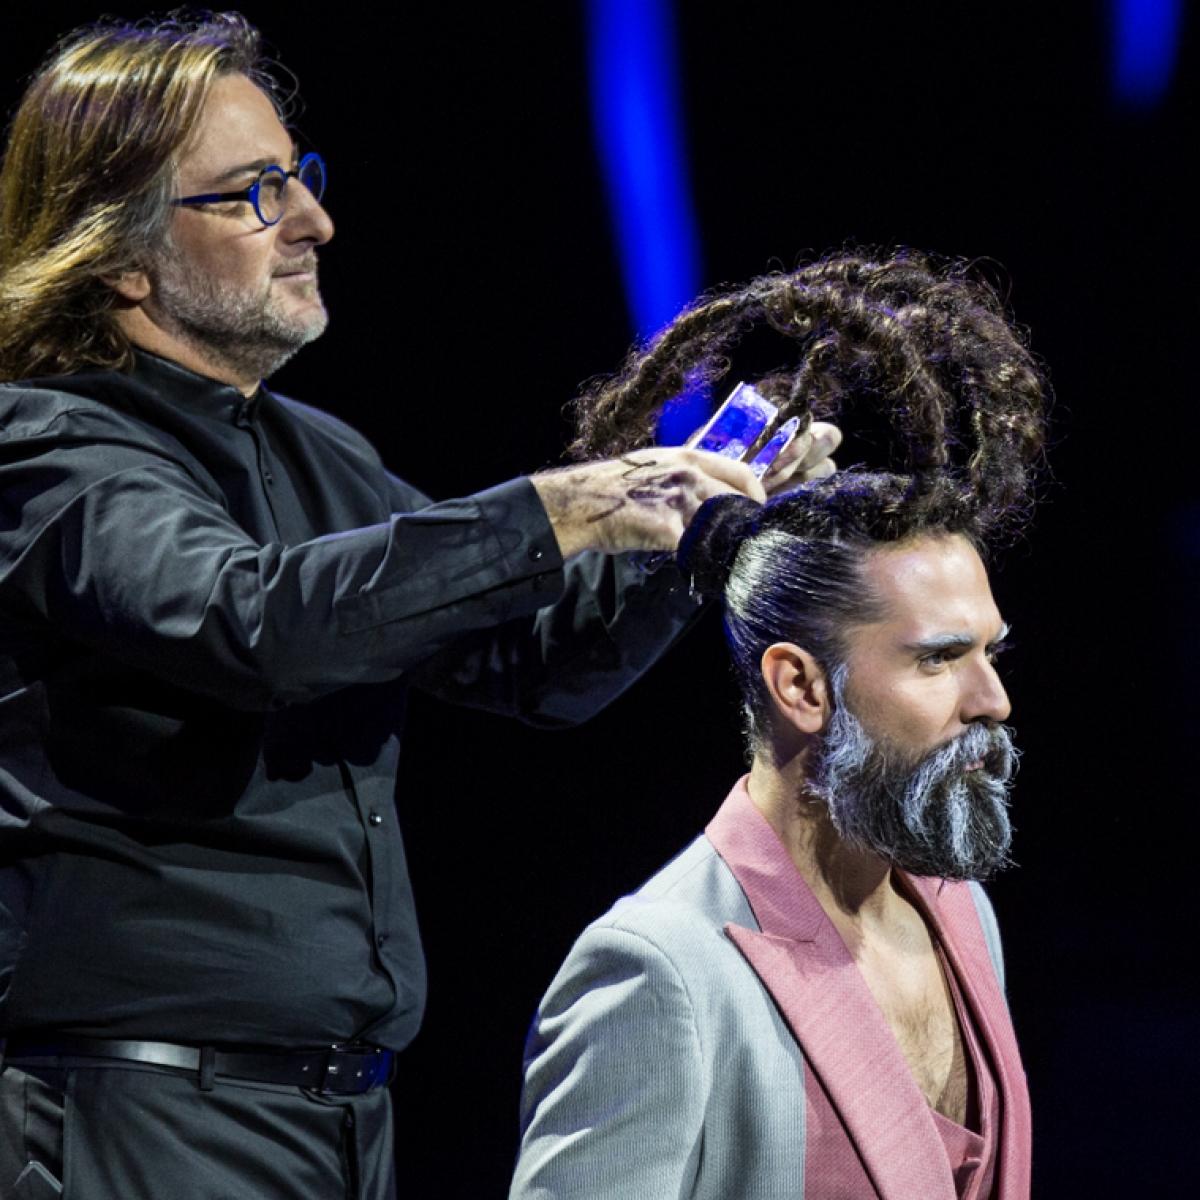 haute coiffure francaise 2016-105